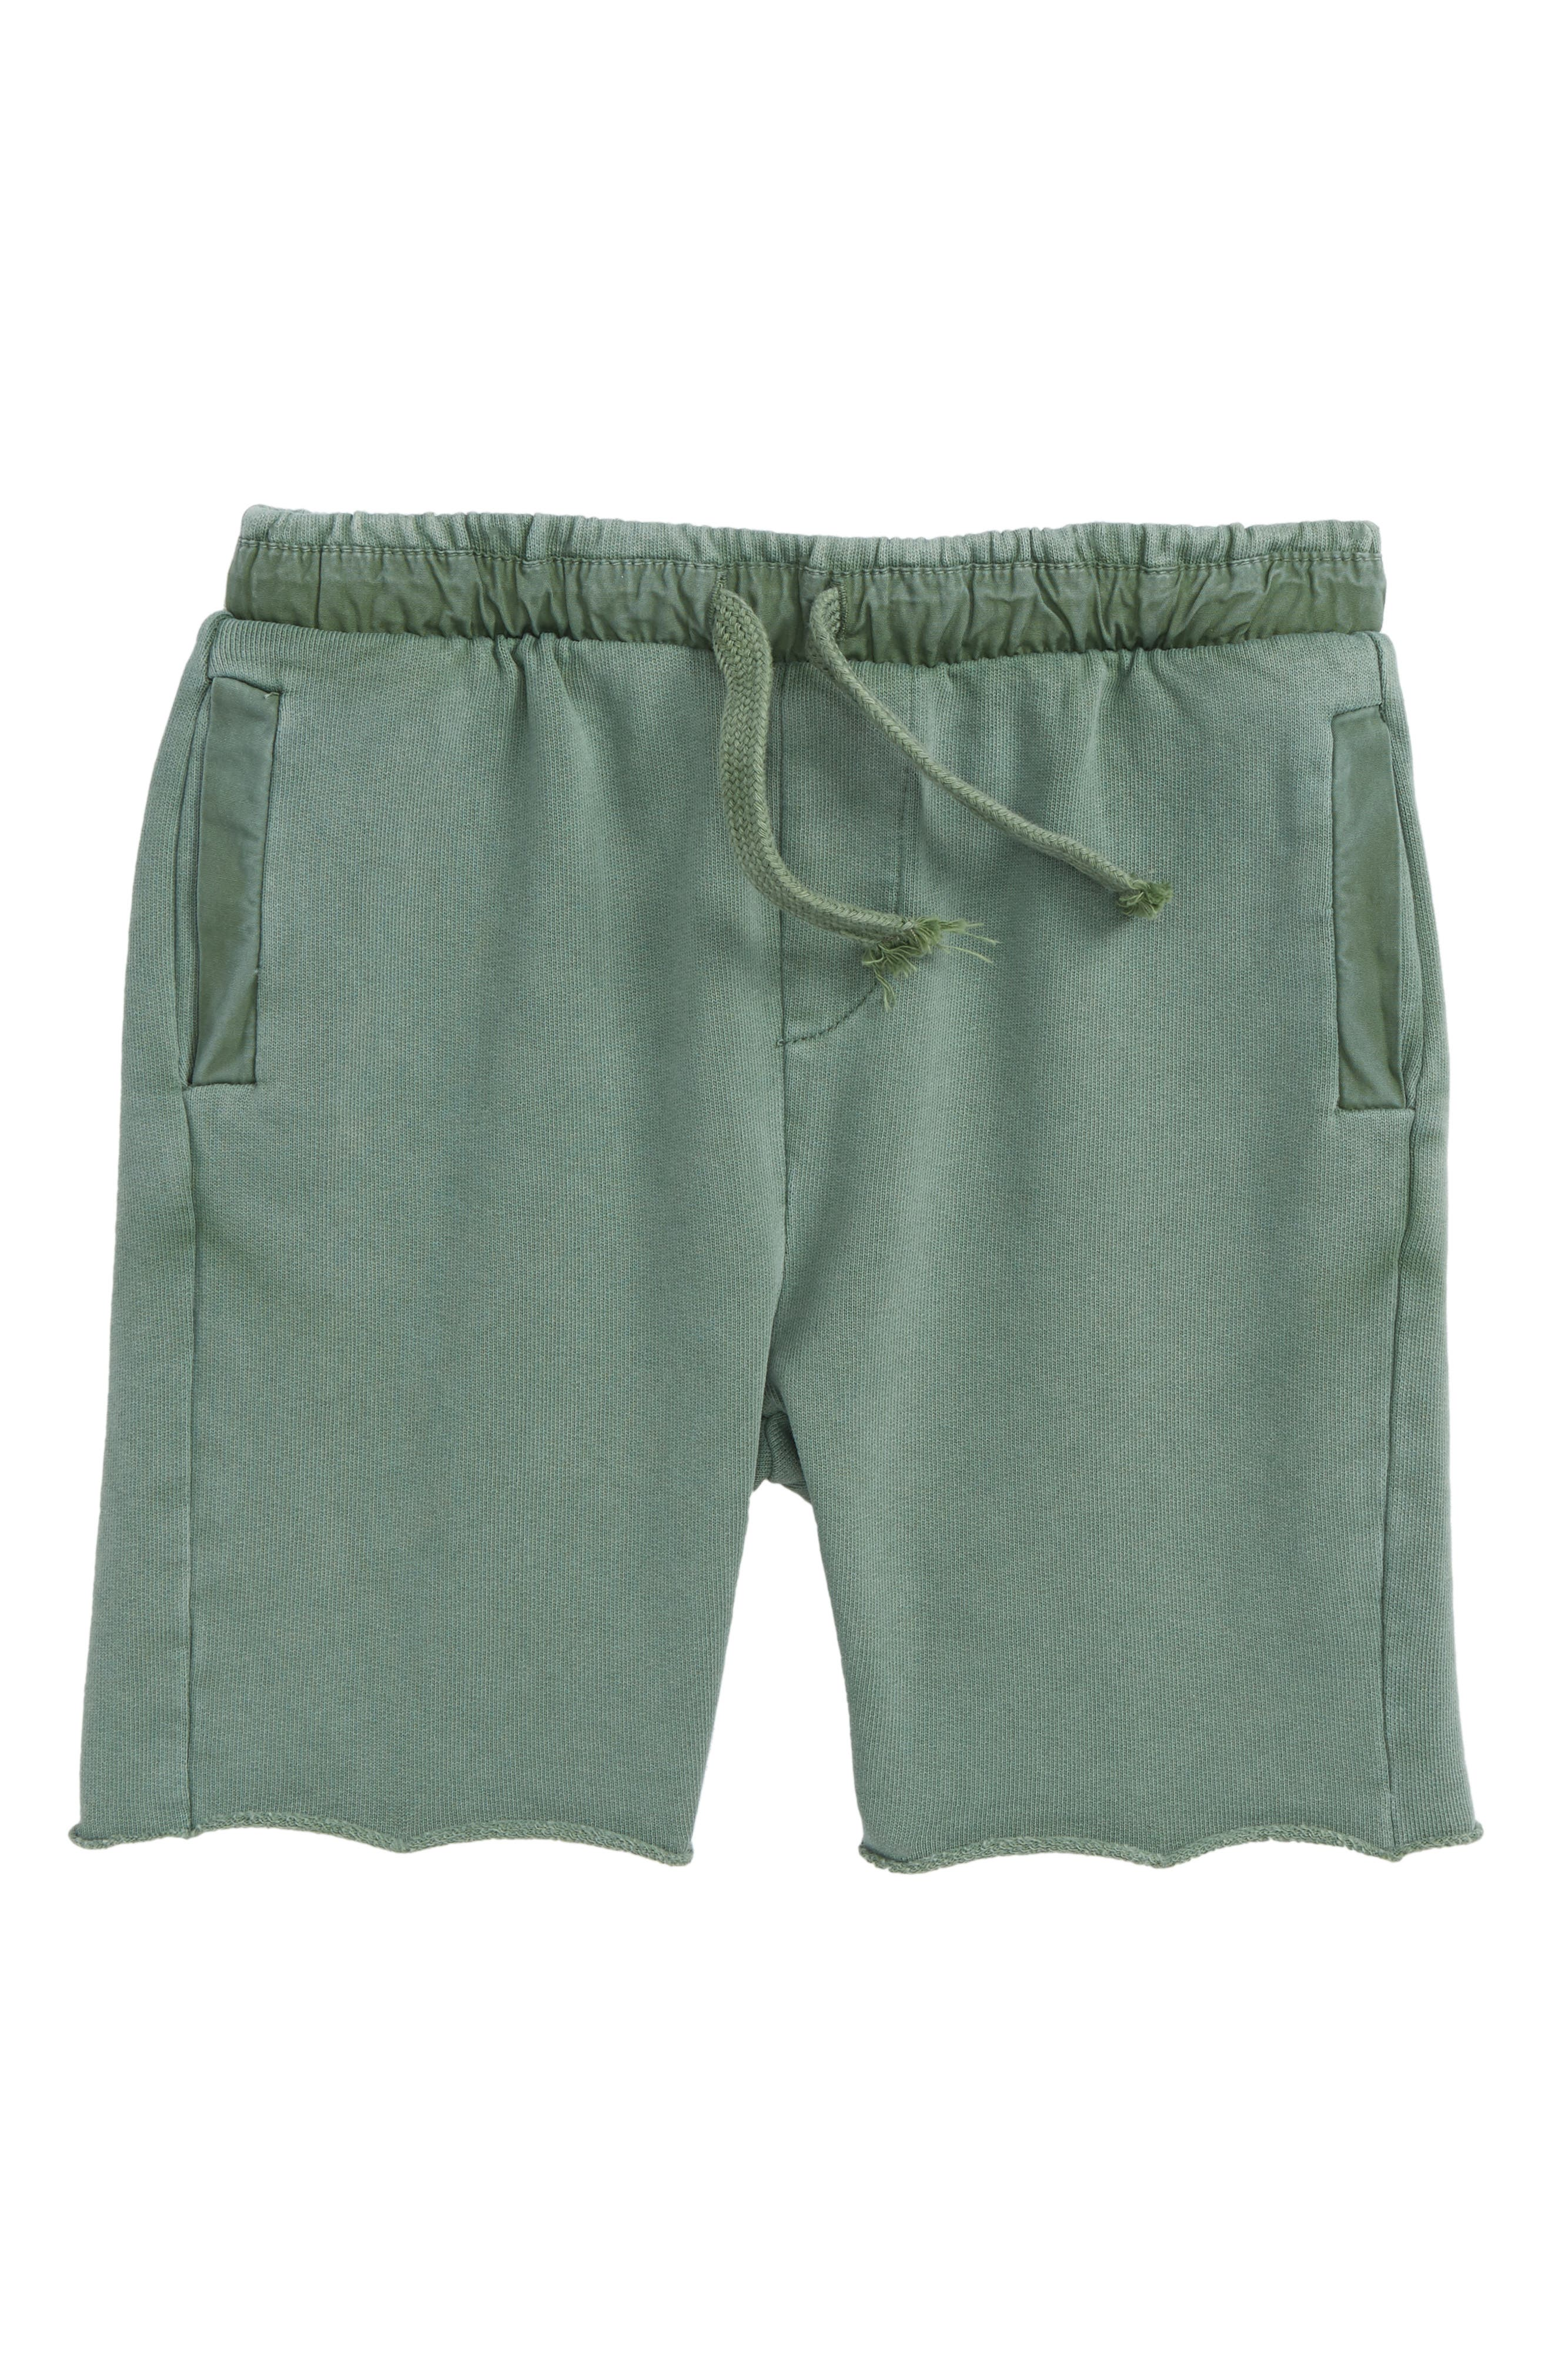 Kids Cullen Organic Cotton Shorts,                         Main,                         color,